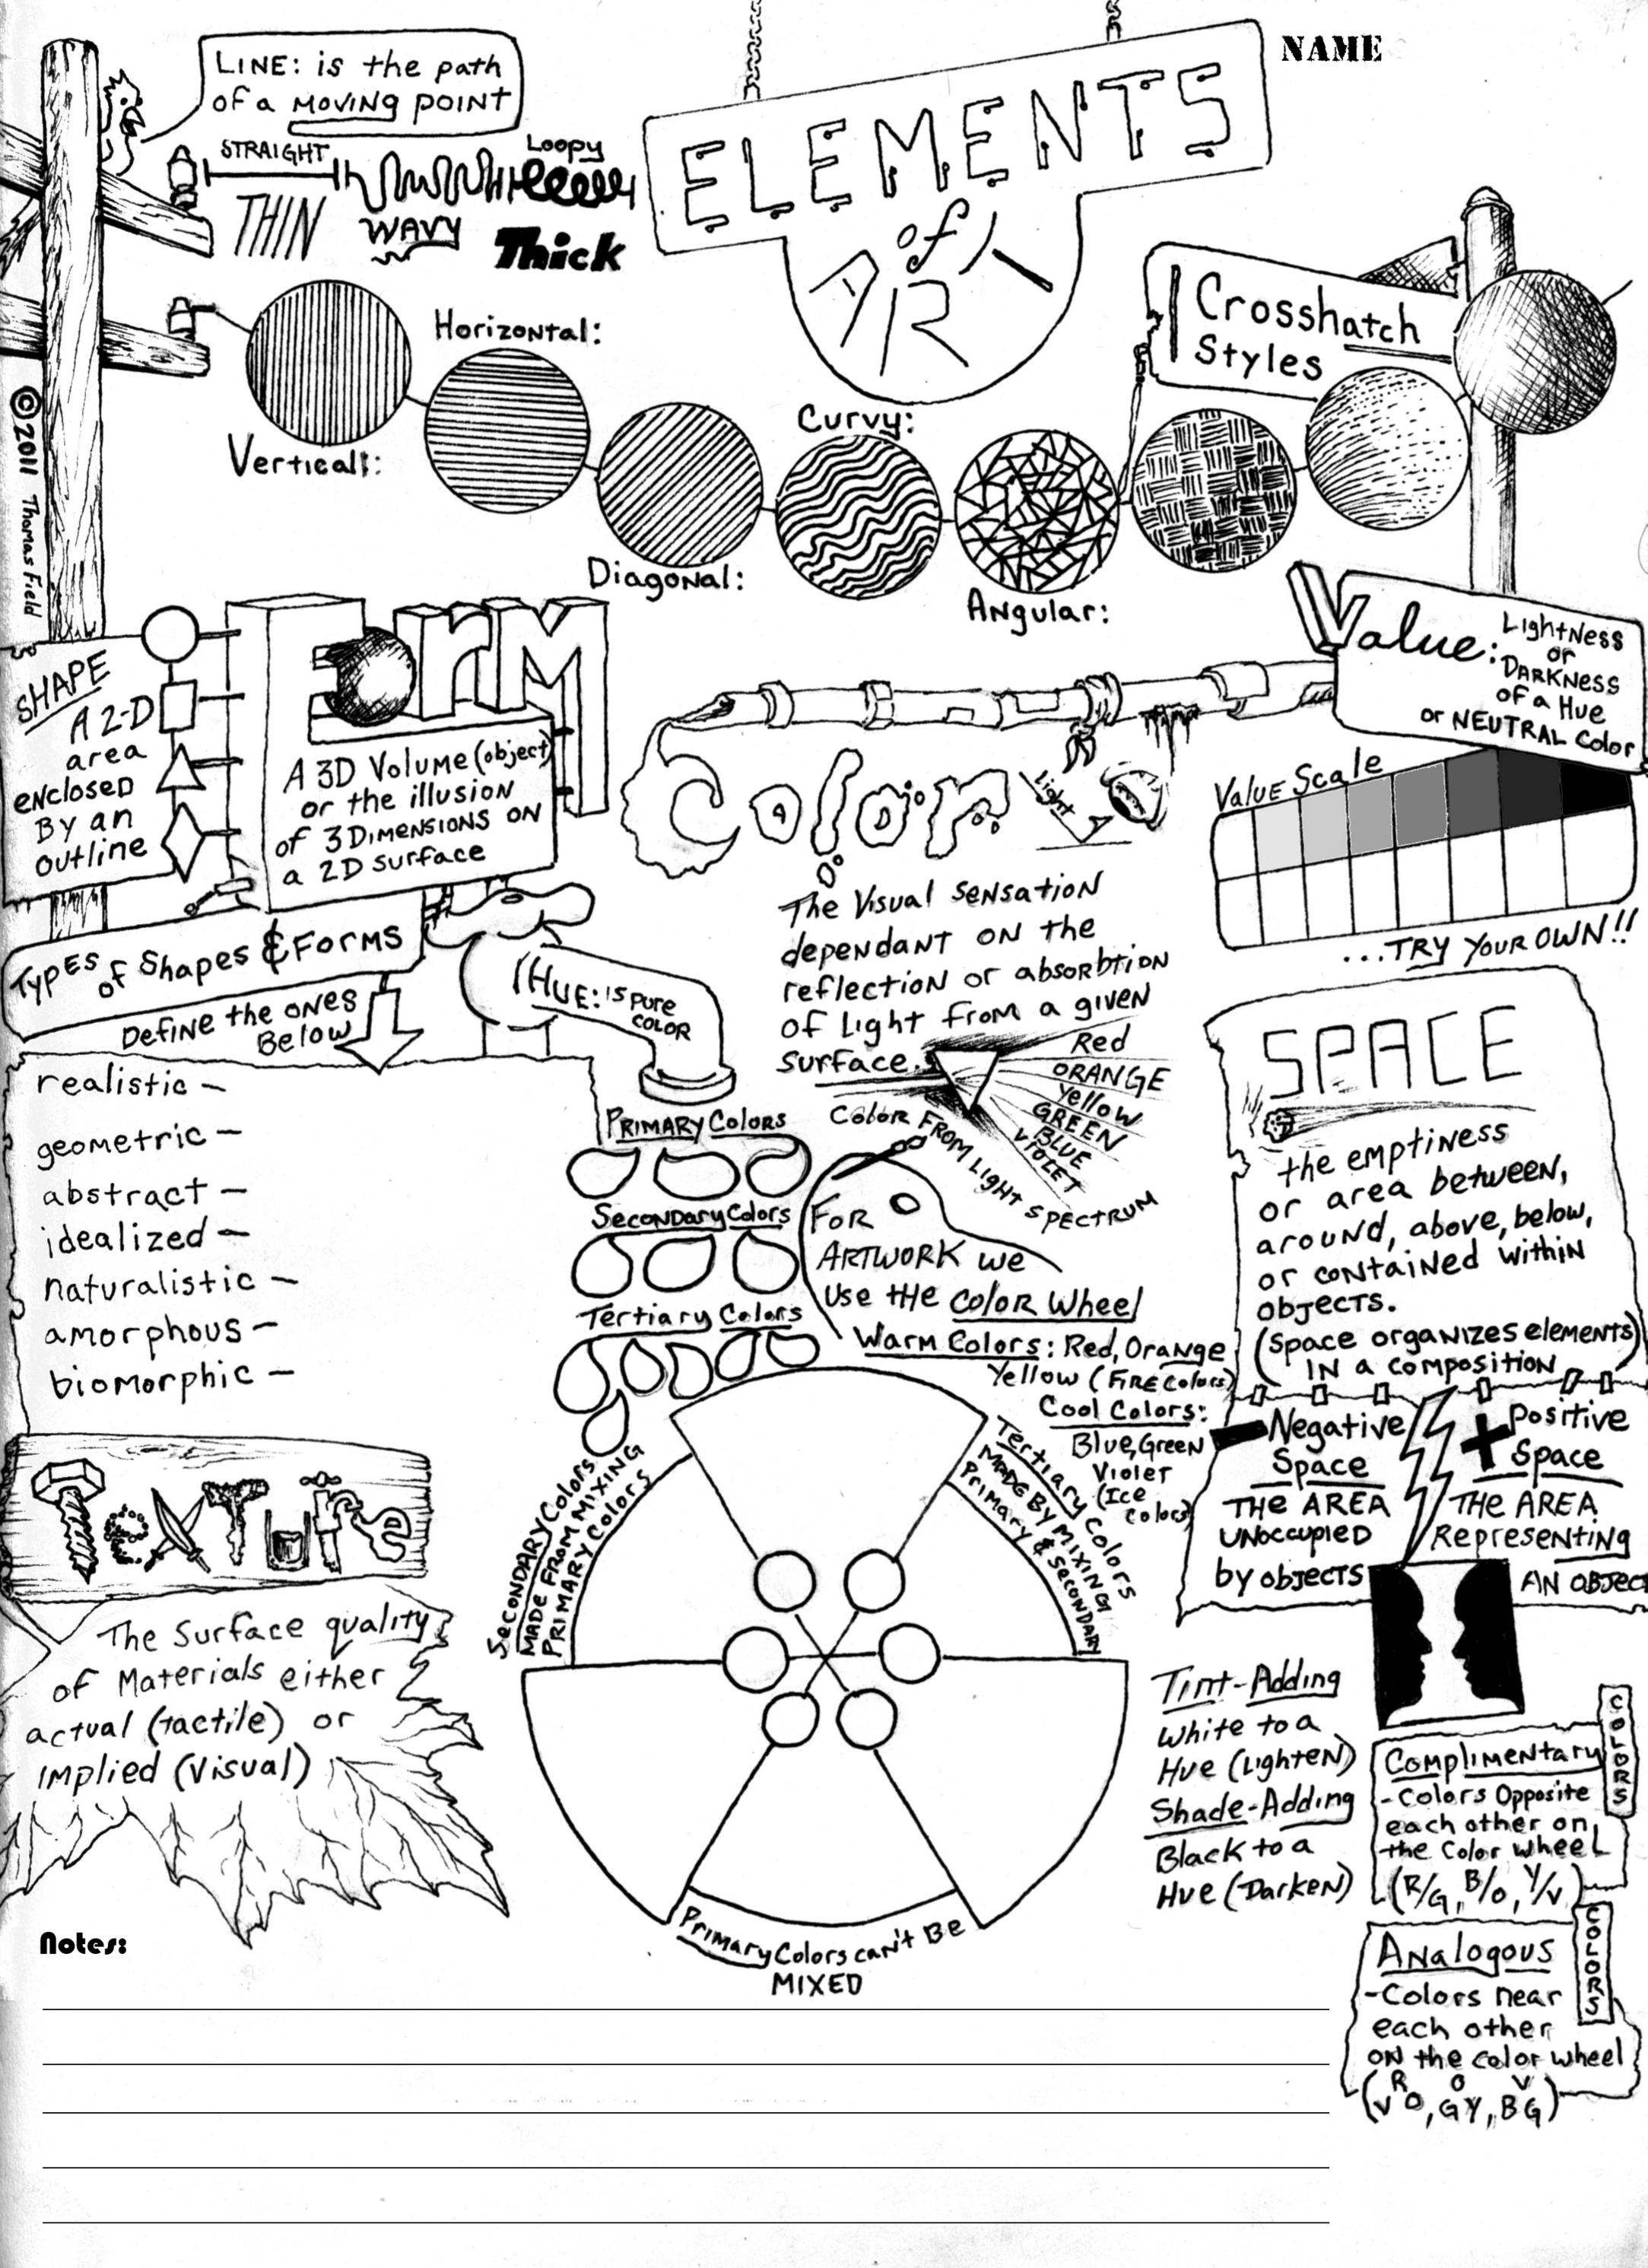 Worksheets Elements Of Art Worksheet elements of art worksheet art